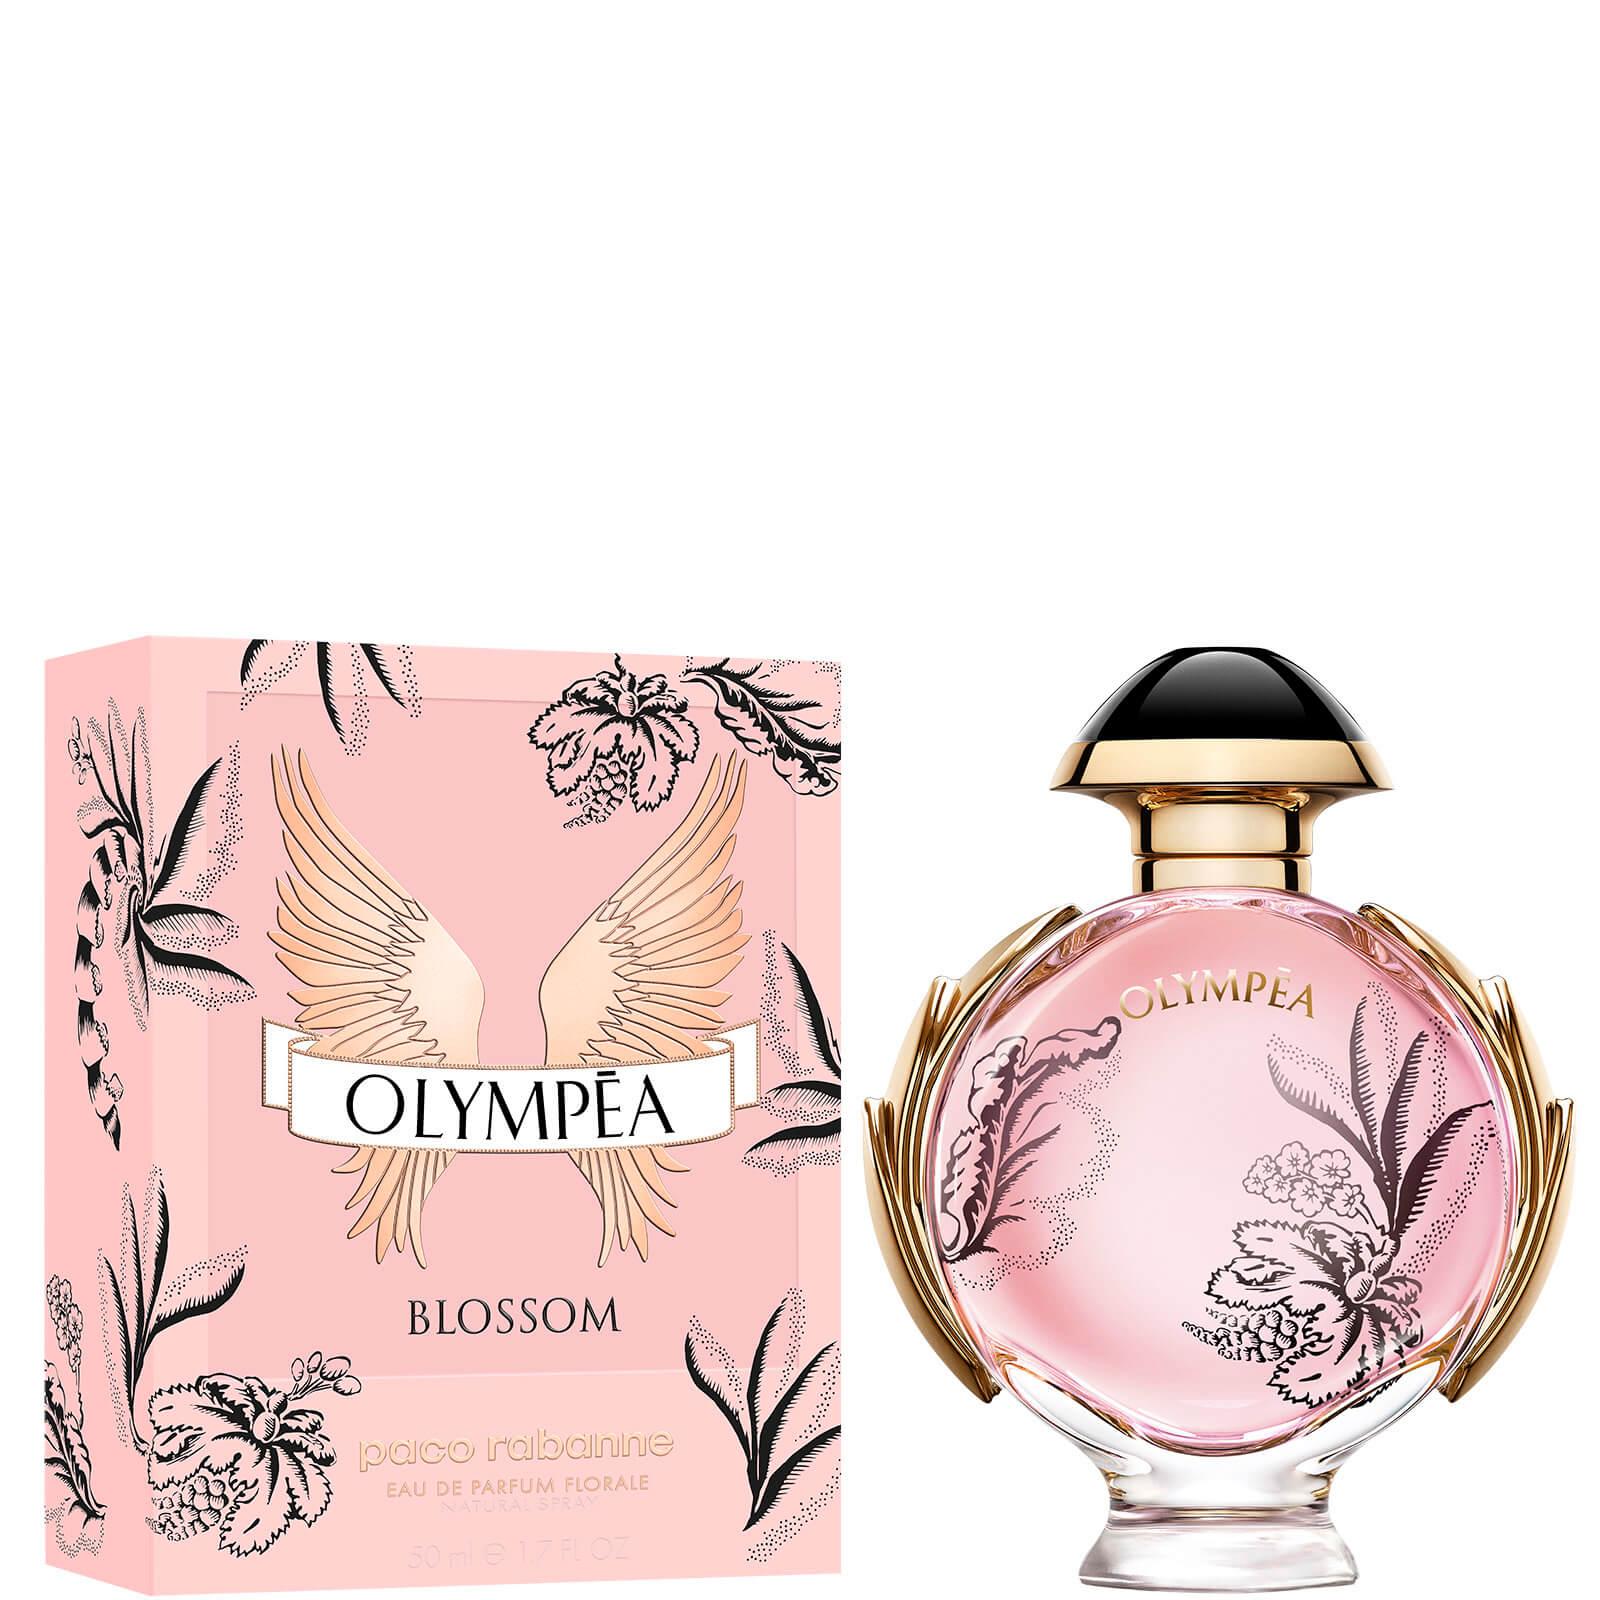 Paco Rabanne Olympéa Blossom Eau de Parfum 50ml